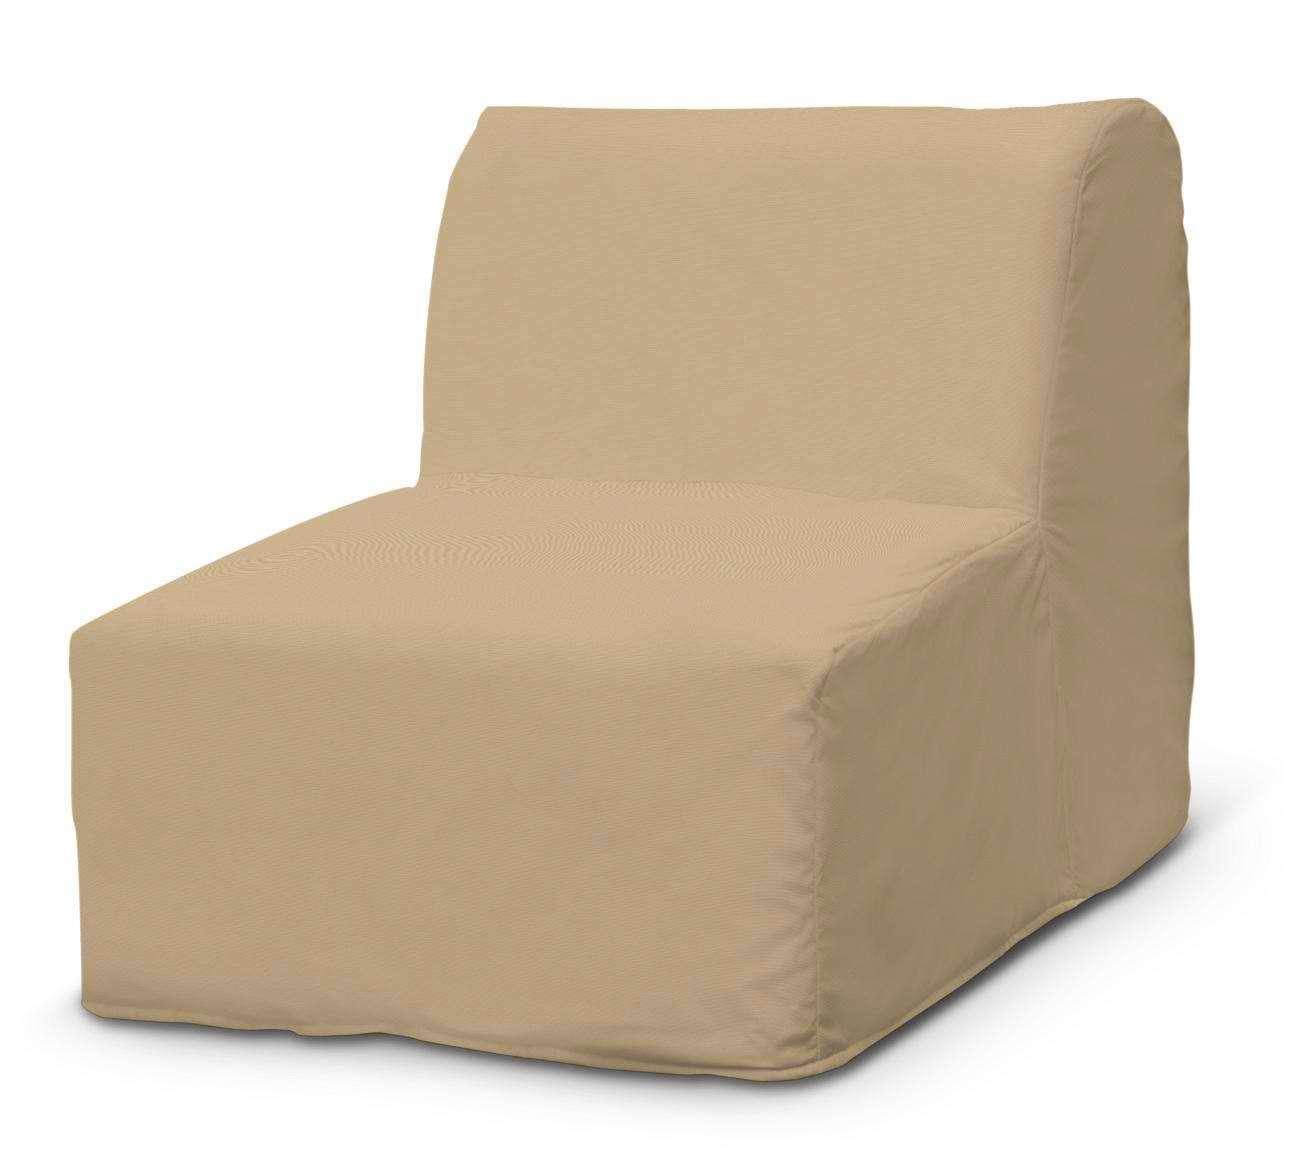 Lycksele Sesselbezug fotel Lycksele von der Kollektion Cotton Panama, Stoff: 702-01